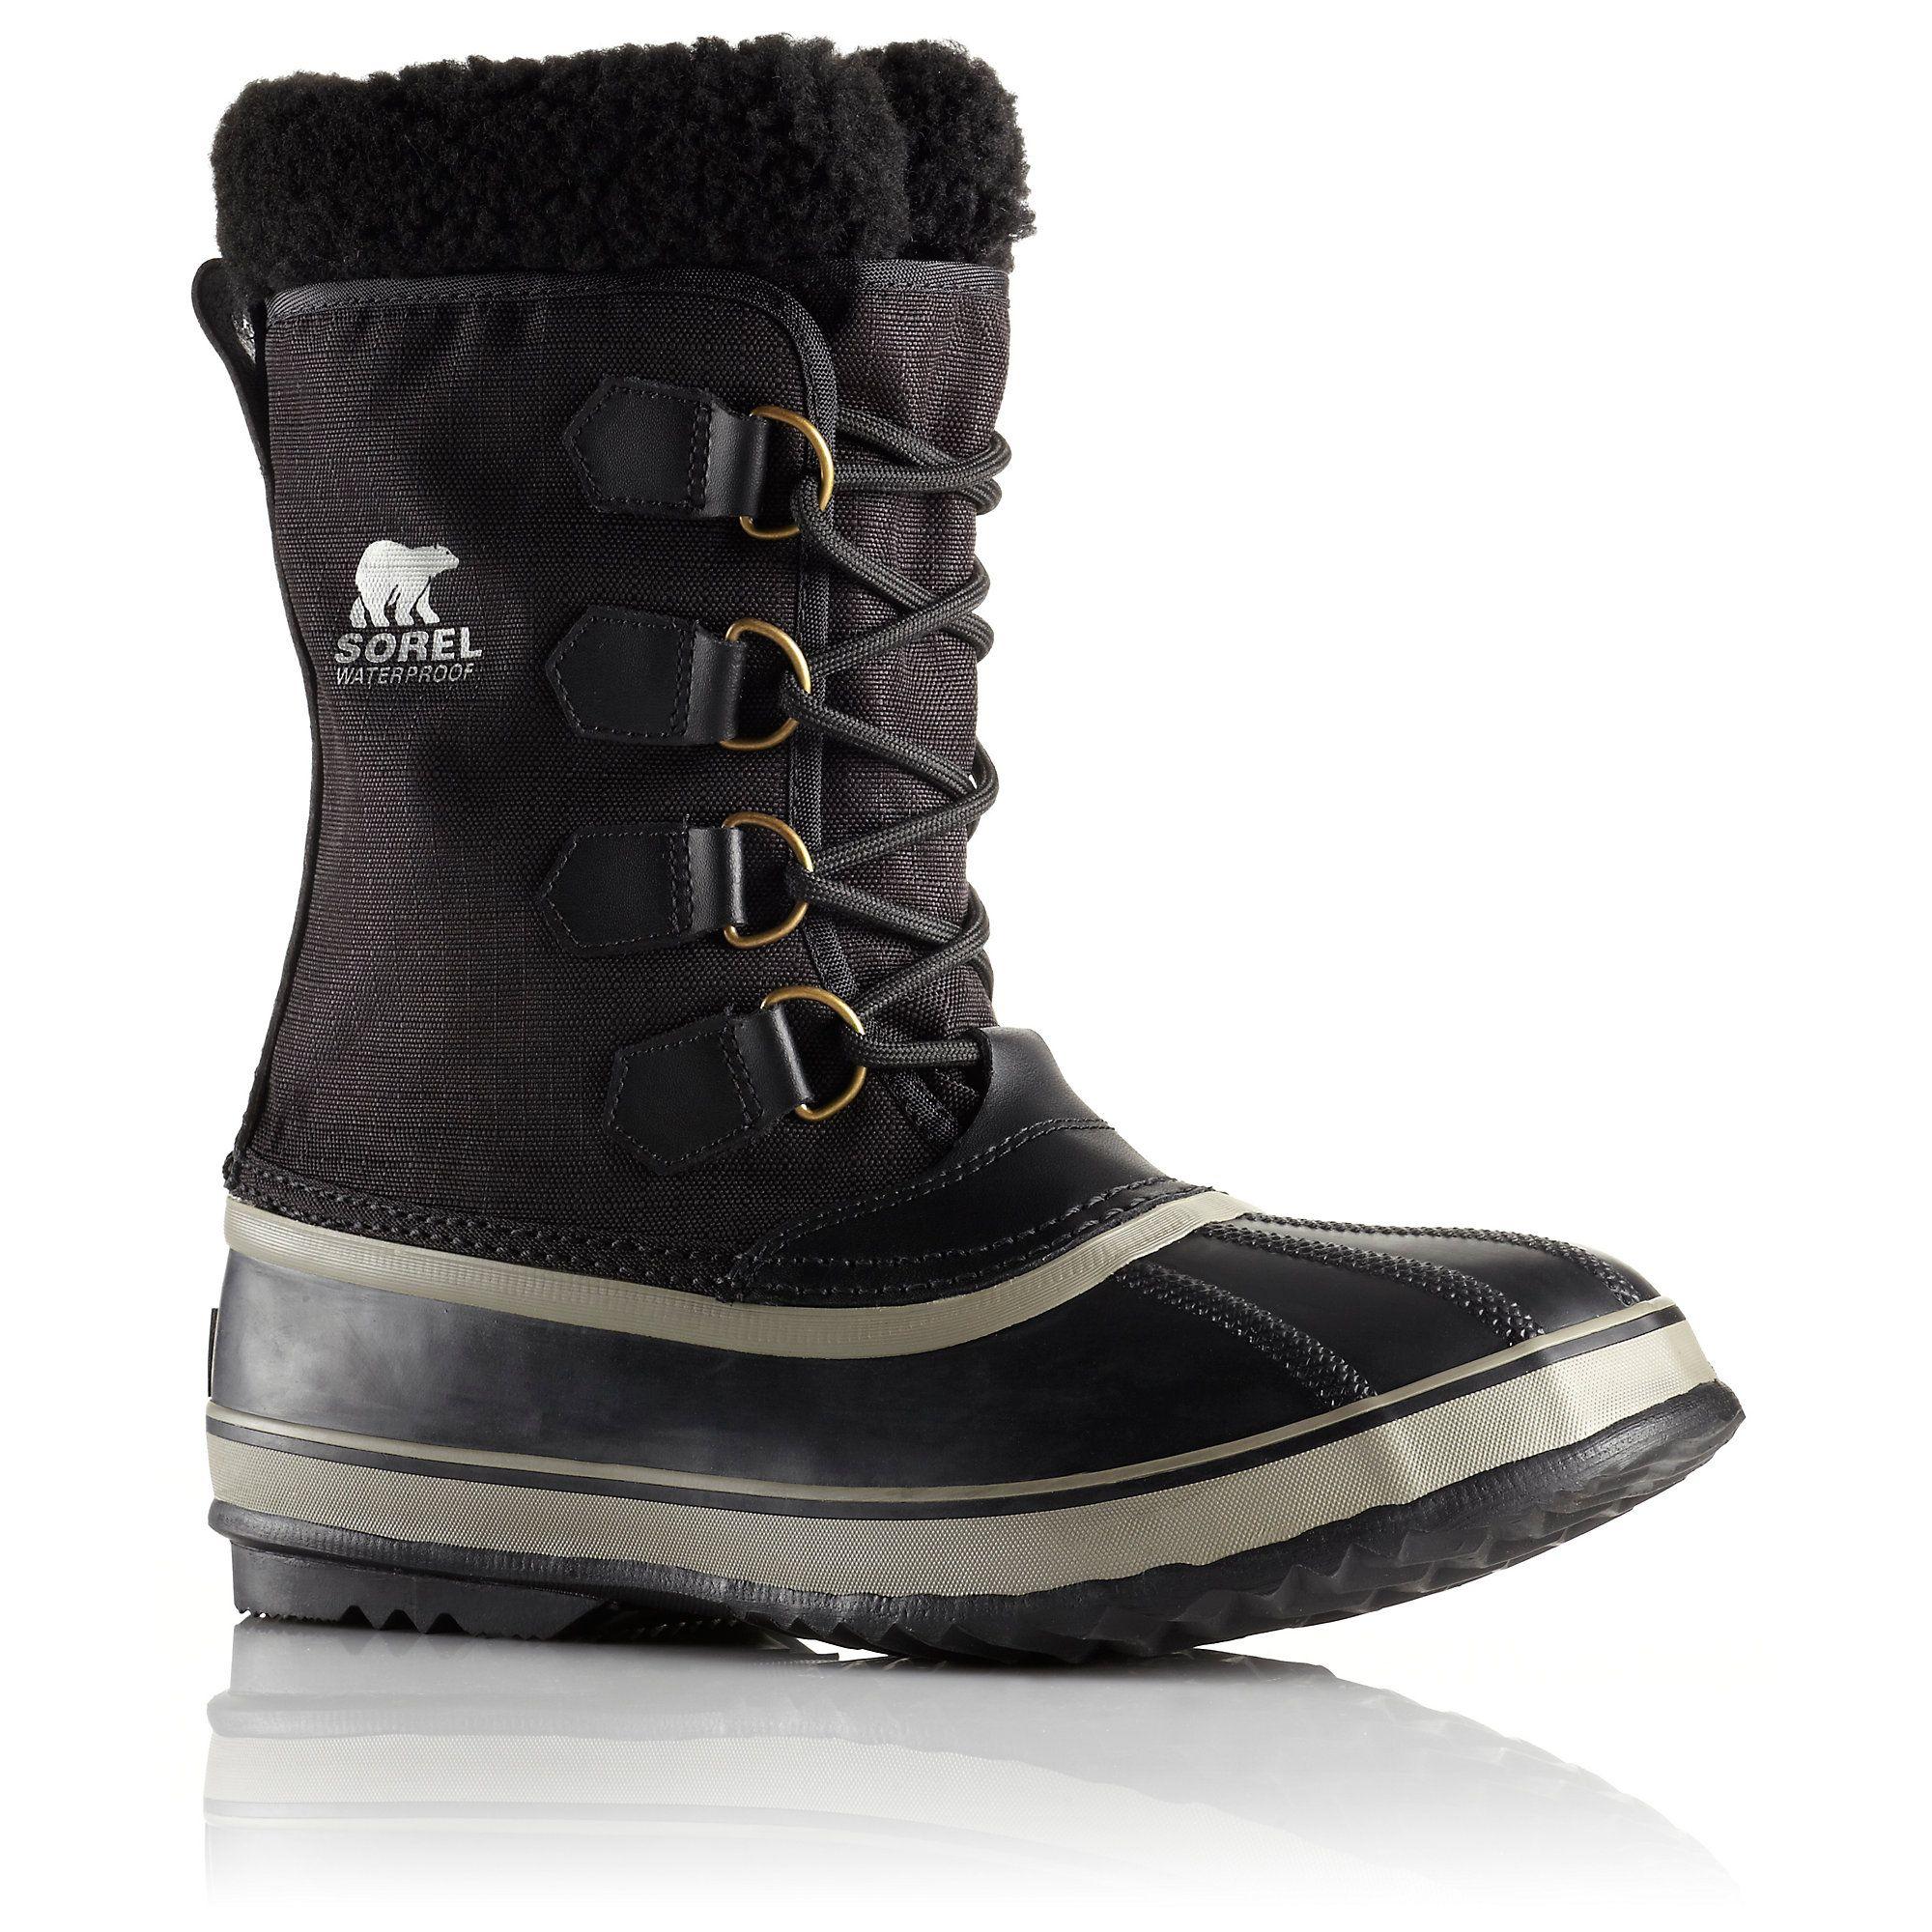 44725680ad1c9 SOREL Men s 1964 Pac Nylon Boot Size 9.5 - Black Tusk Abrigos